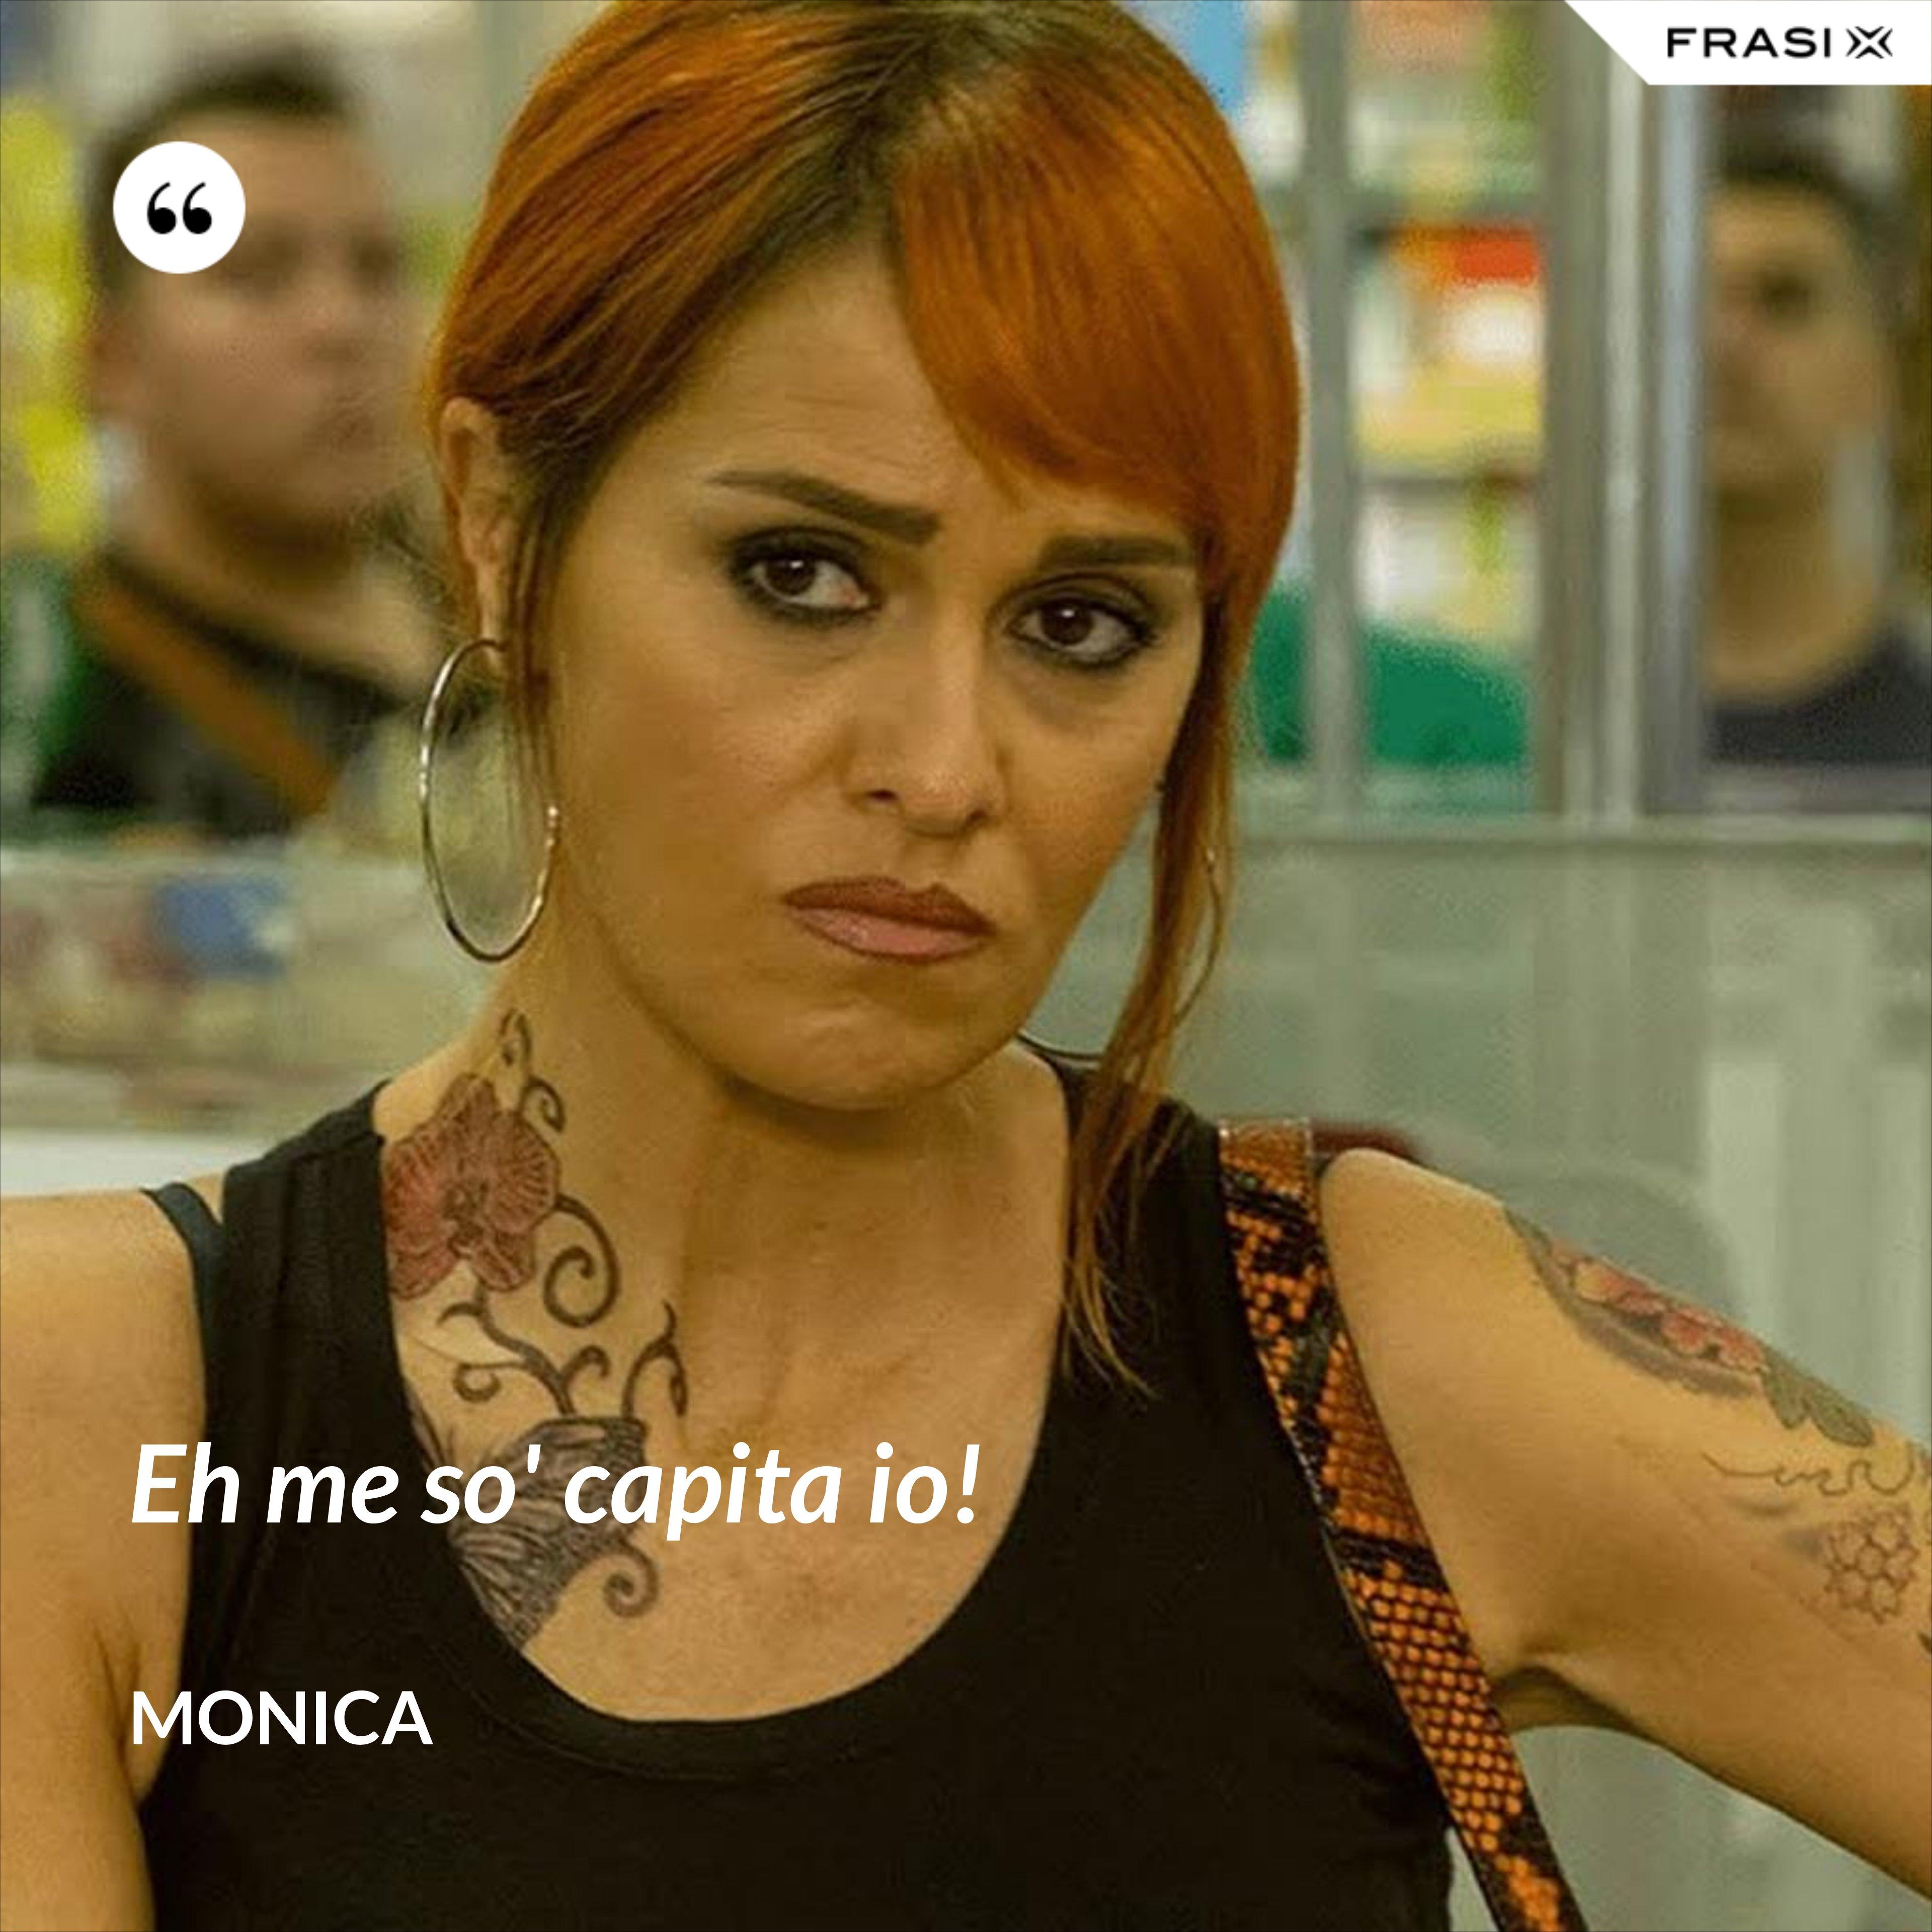 Eh me so' capita io! - Monica